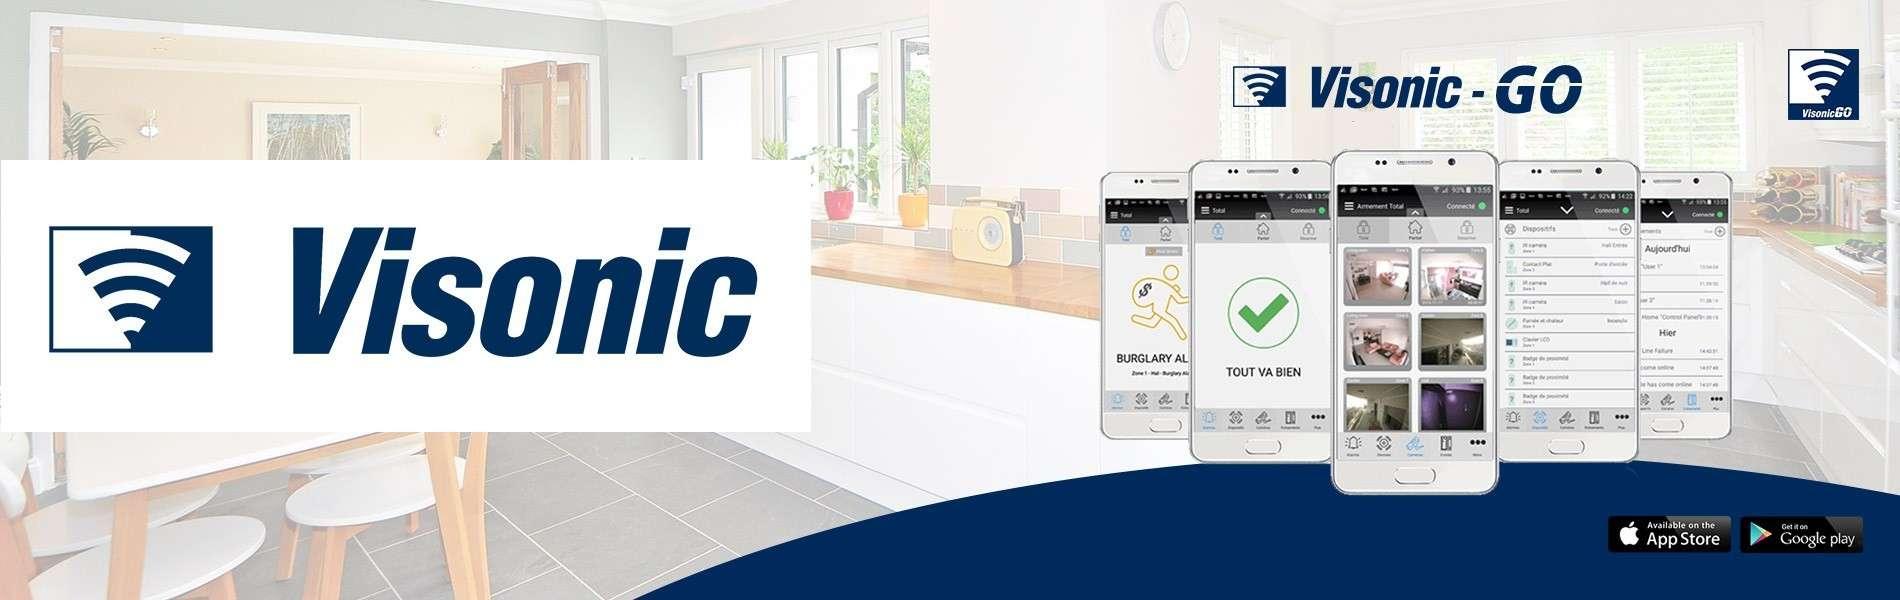 VISONIC-GO : Application mobile pour PowerMAX et PowerMASTER